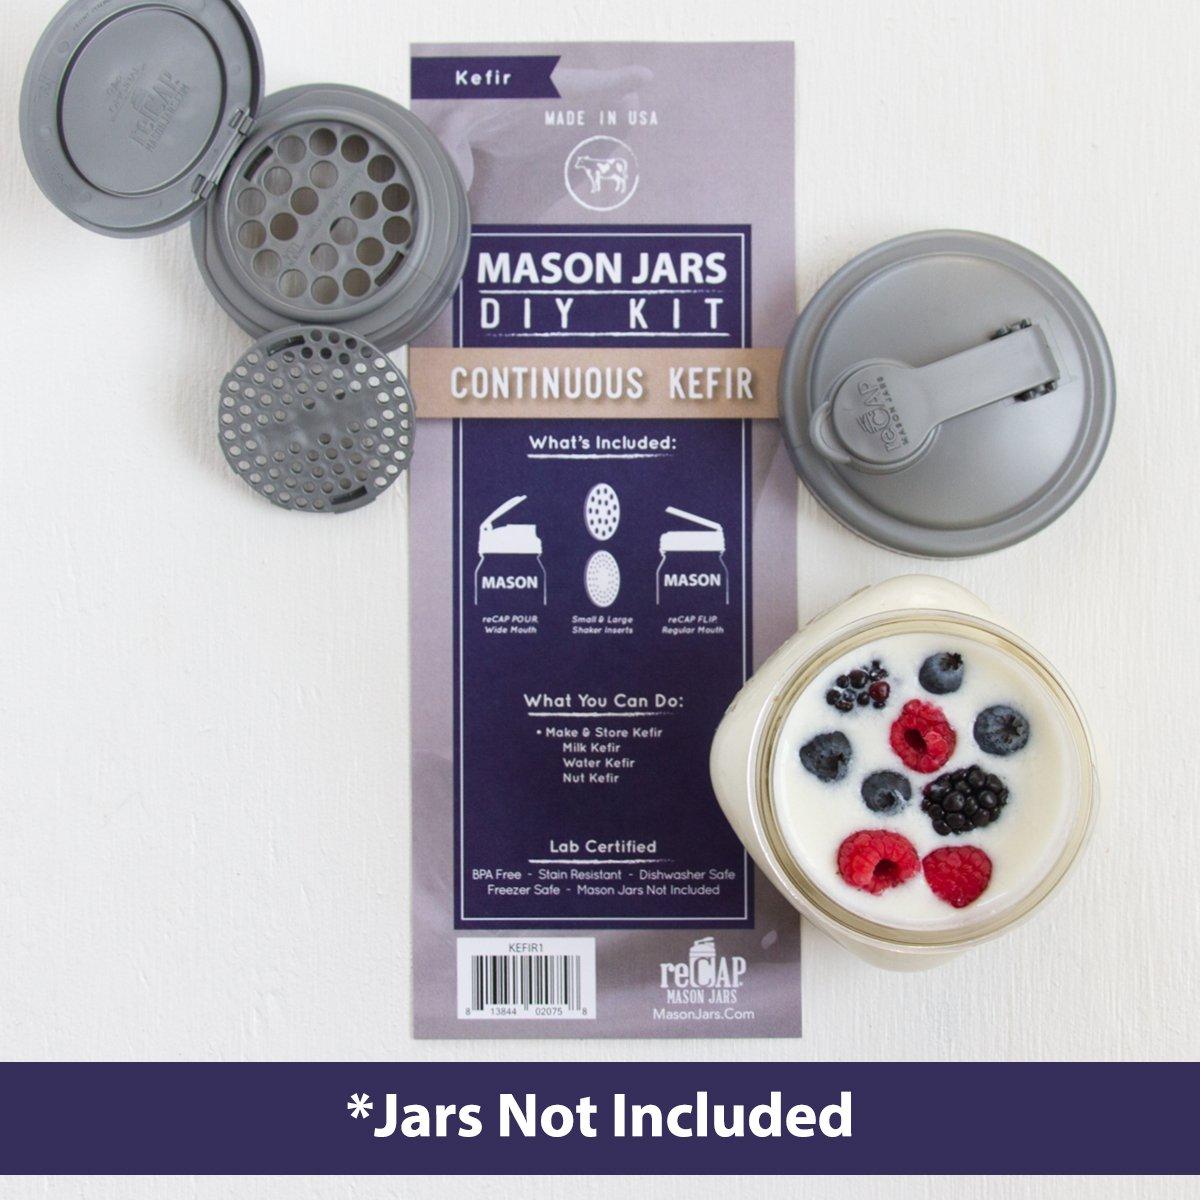 reCAP Mason Jars DIY Kit - Continuous Kefir: Jars Not Included by reCAP